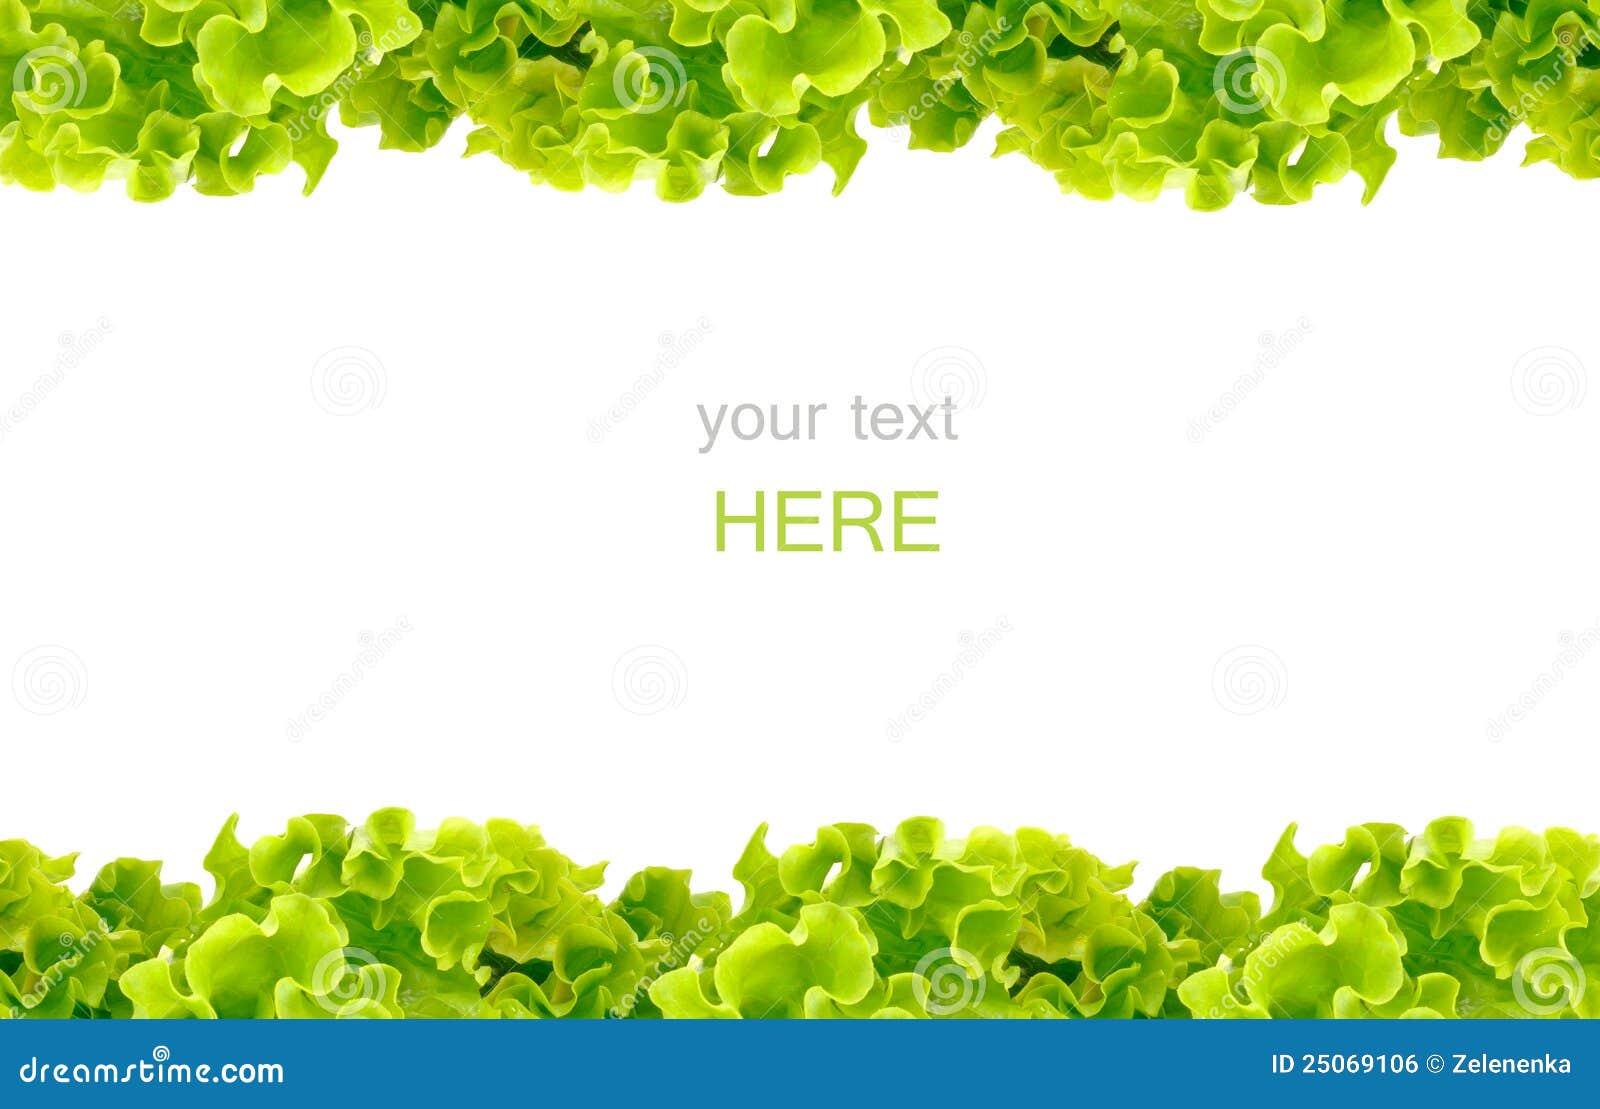 fresh green salad frame royalty free stock image image lettuce clipart free lettuce clipart